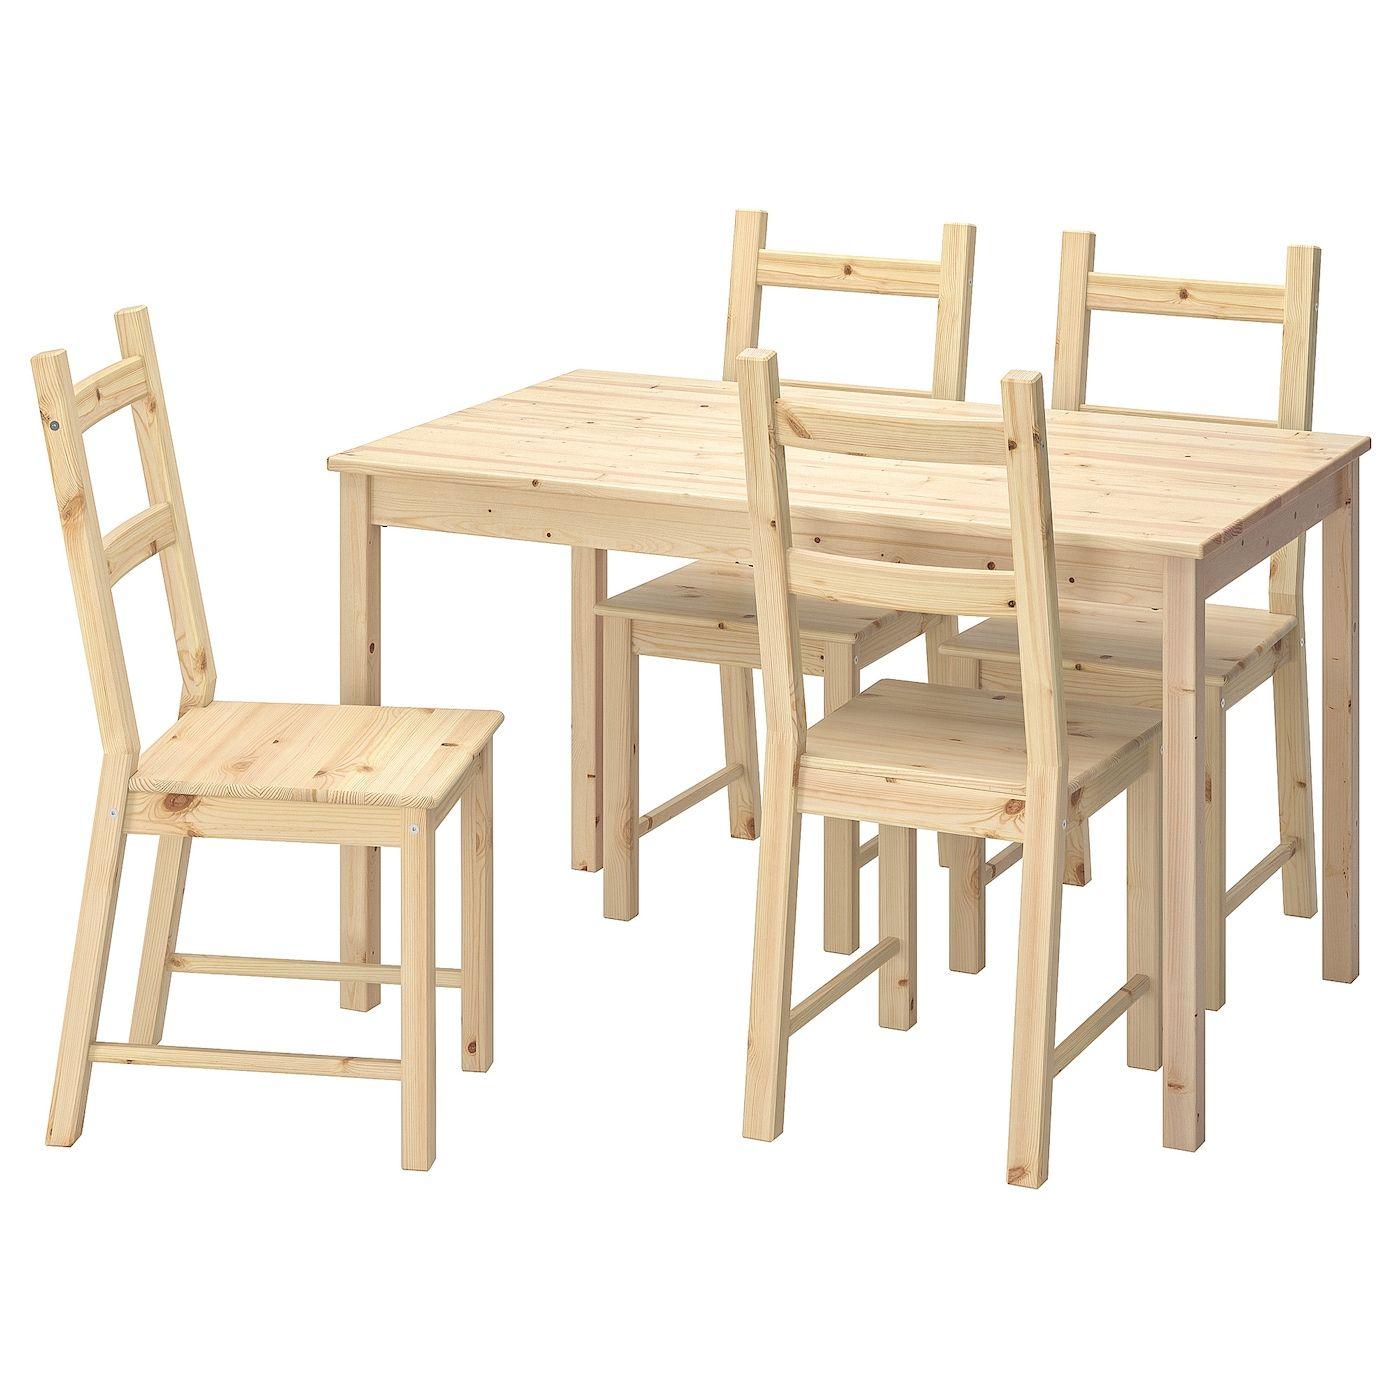 Ingo Ivar Table And 4 Chairs Pine Pine Table Chair Ikea